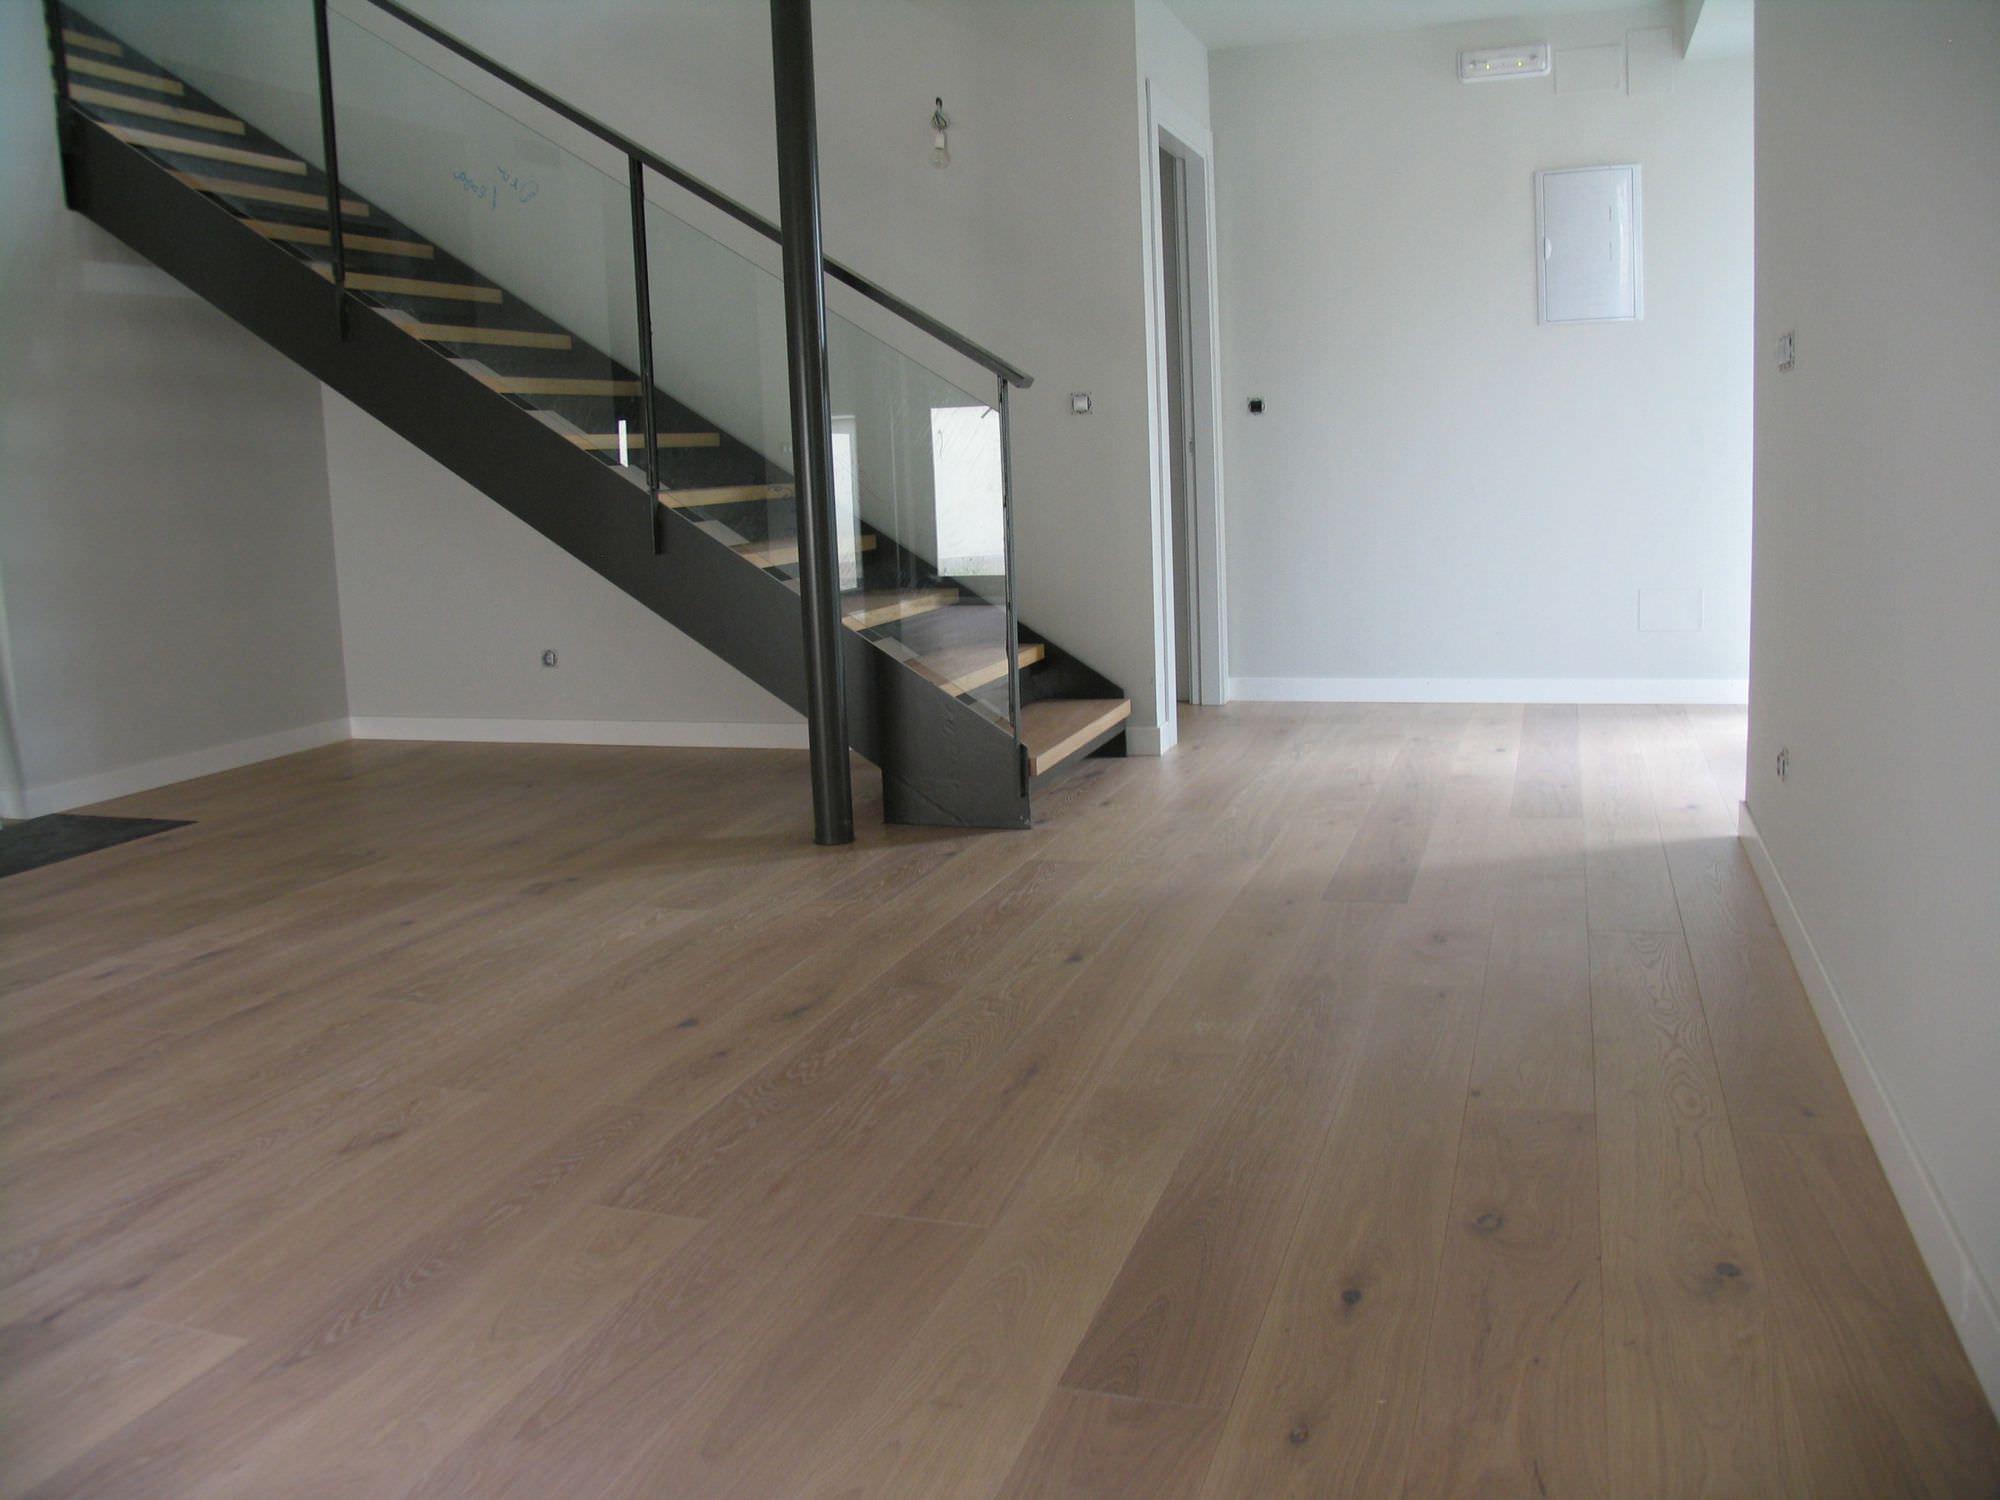 Mafi Parkett engineered parquet floor glued floating oak oak character